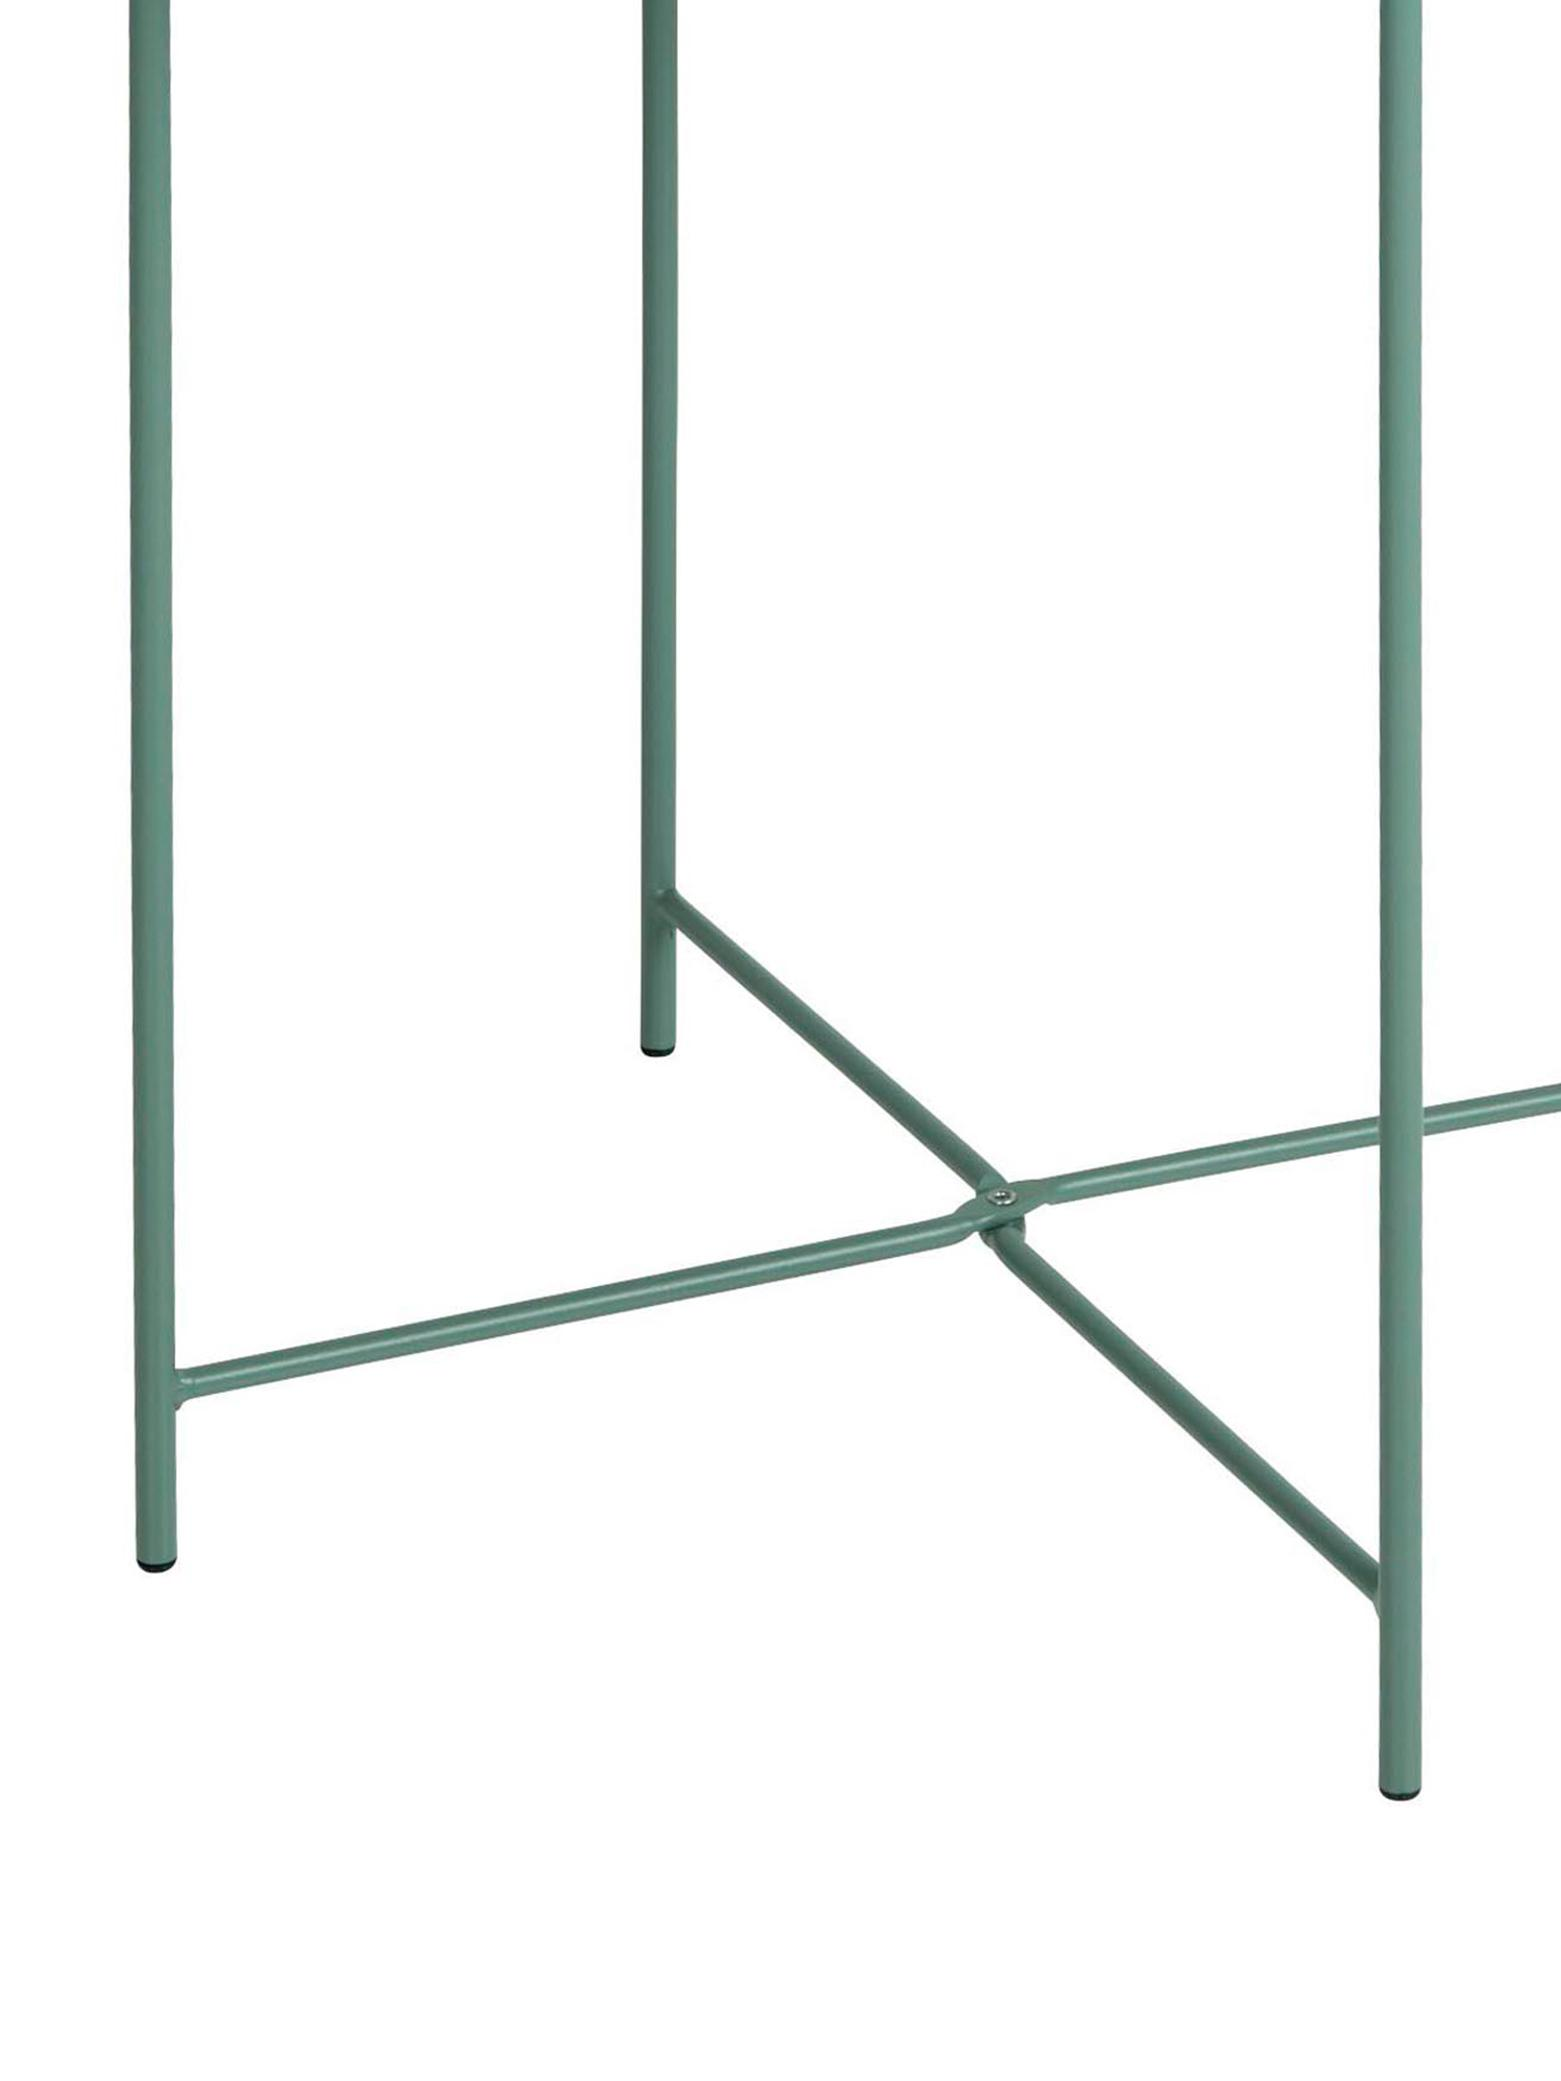 Tavolino-vassoio in metallo Sangro, Metallo verniciato a polvere, Verde, Ø 46 x Alt. 52 cm